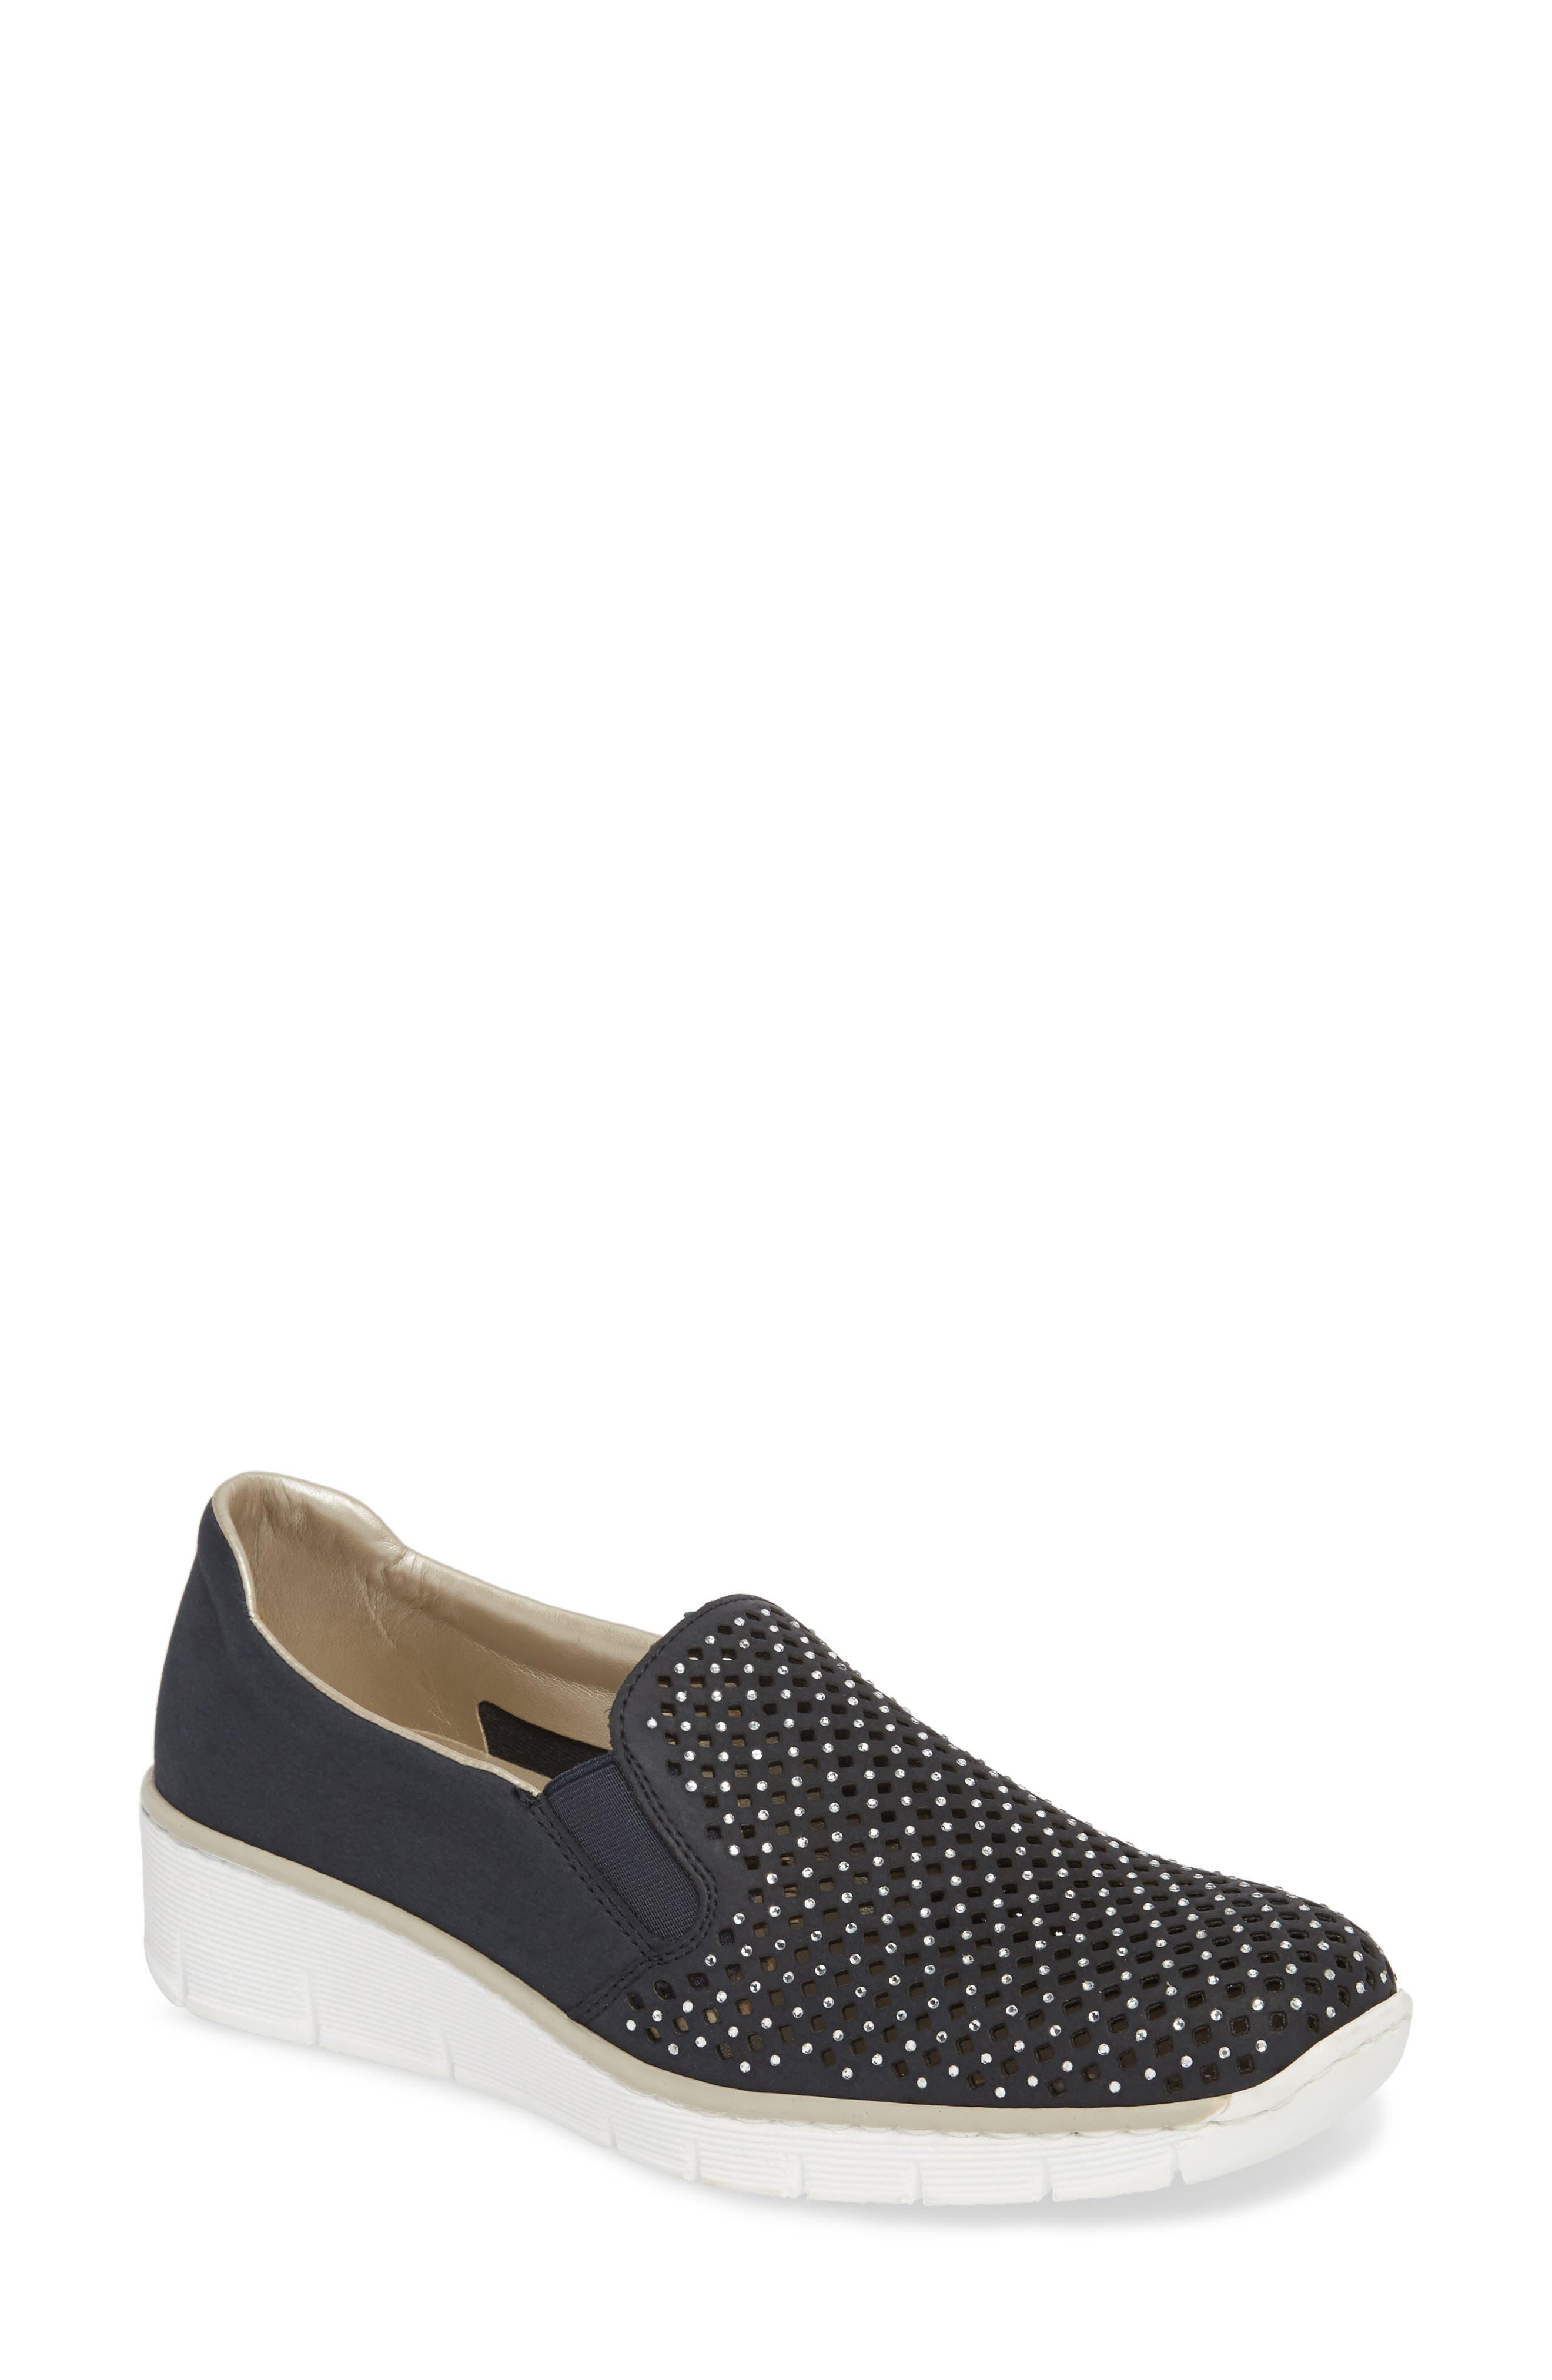 Doris A6 Wedge Sneaker,                         Main,                         color, 401